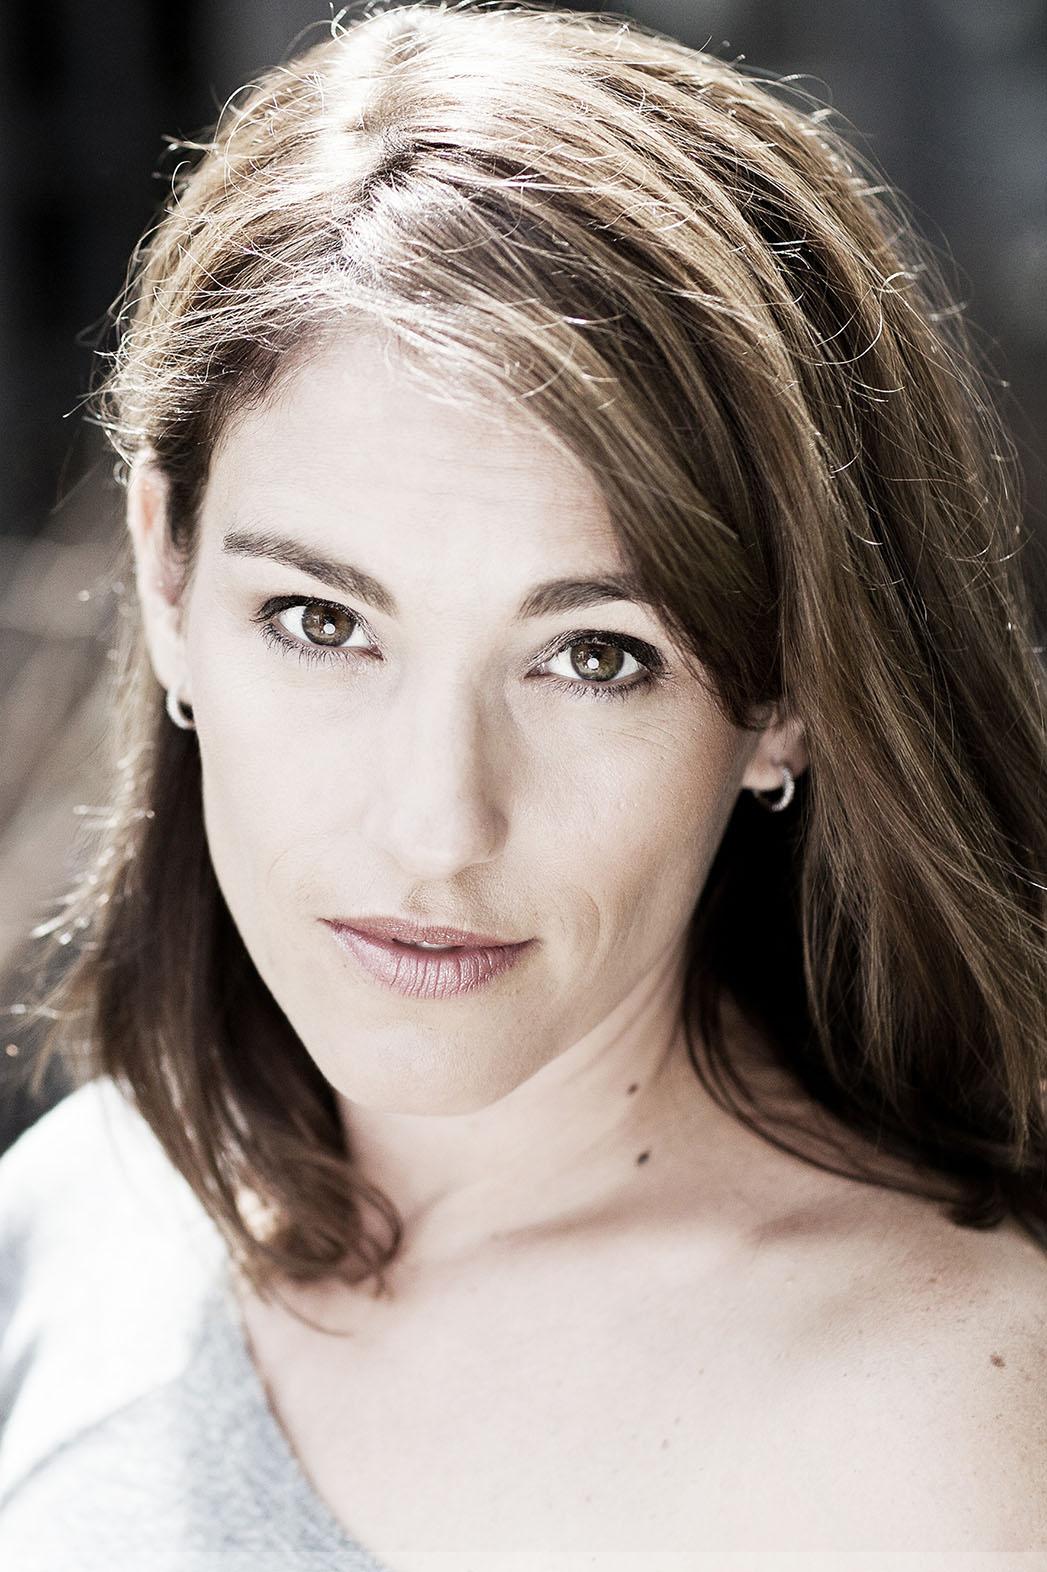 Amy Jo Johnson Headshot - P 2014